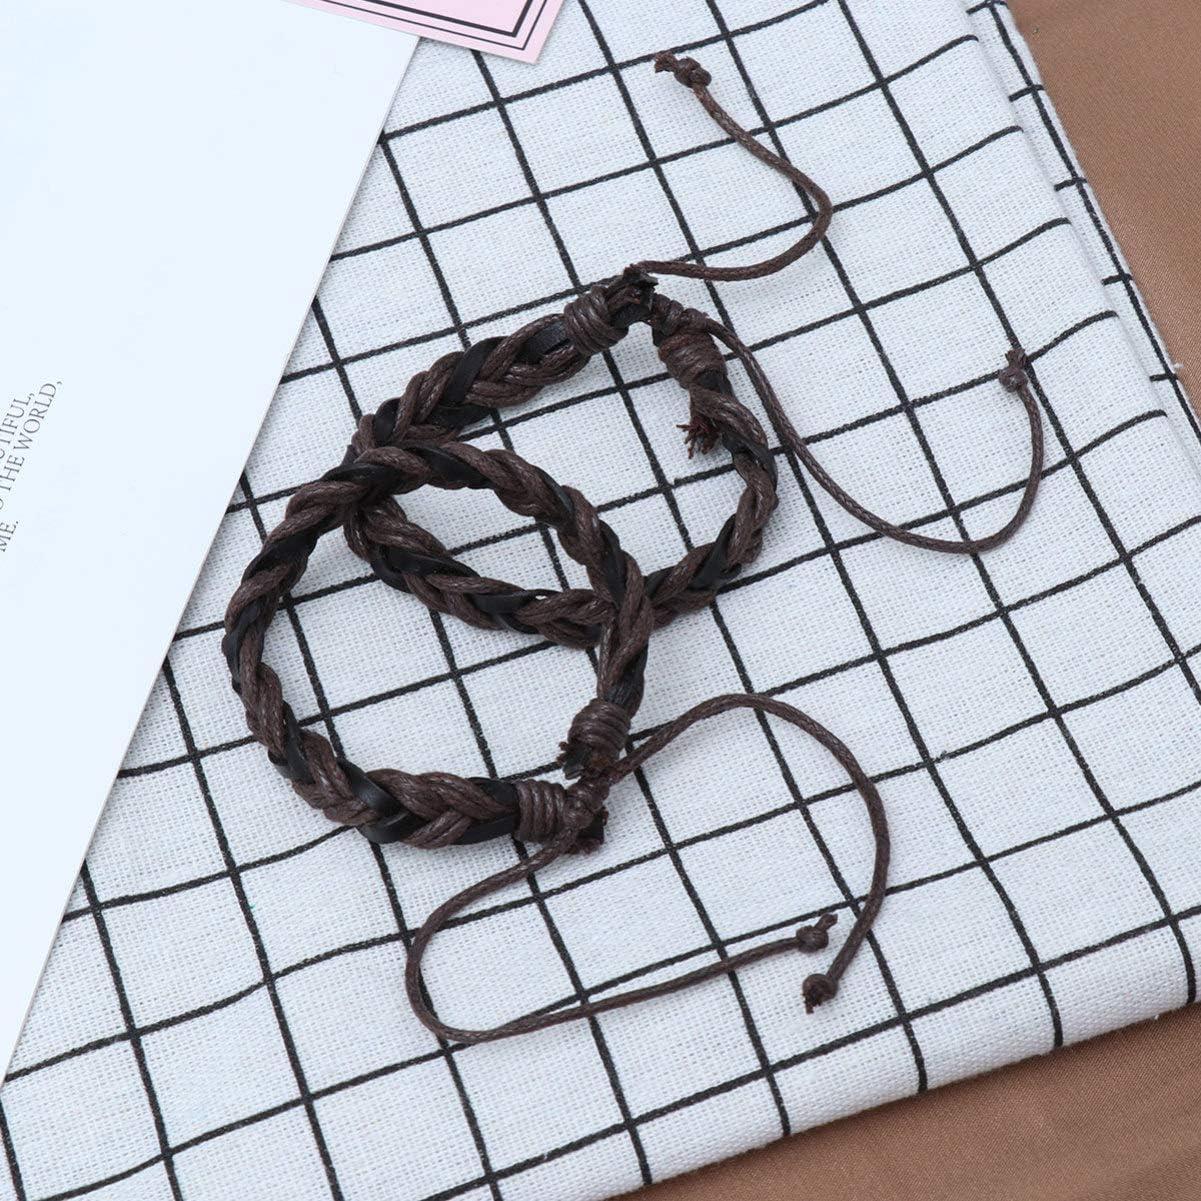 Black SUPVOX 10PCS Leather Friendship Bracelet Adjustable Bracelet Wrist Bracelets Woven Bracelets for Men Women